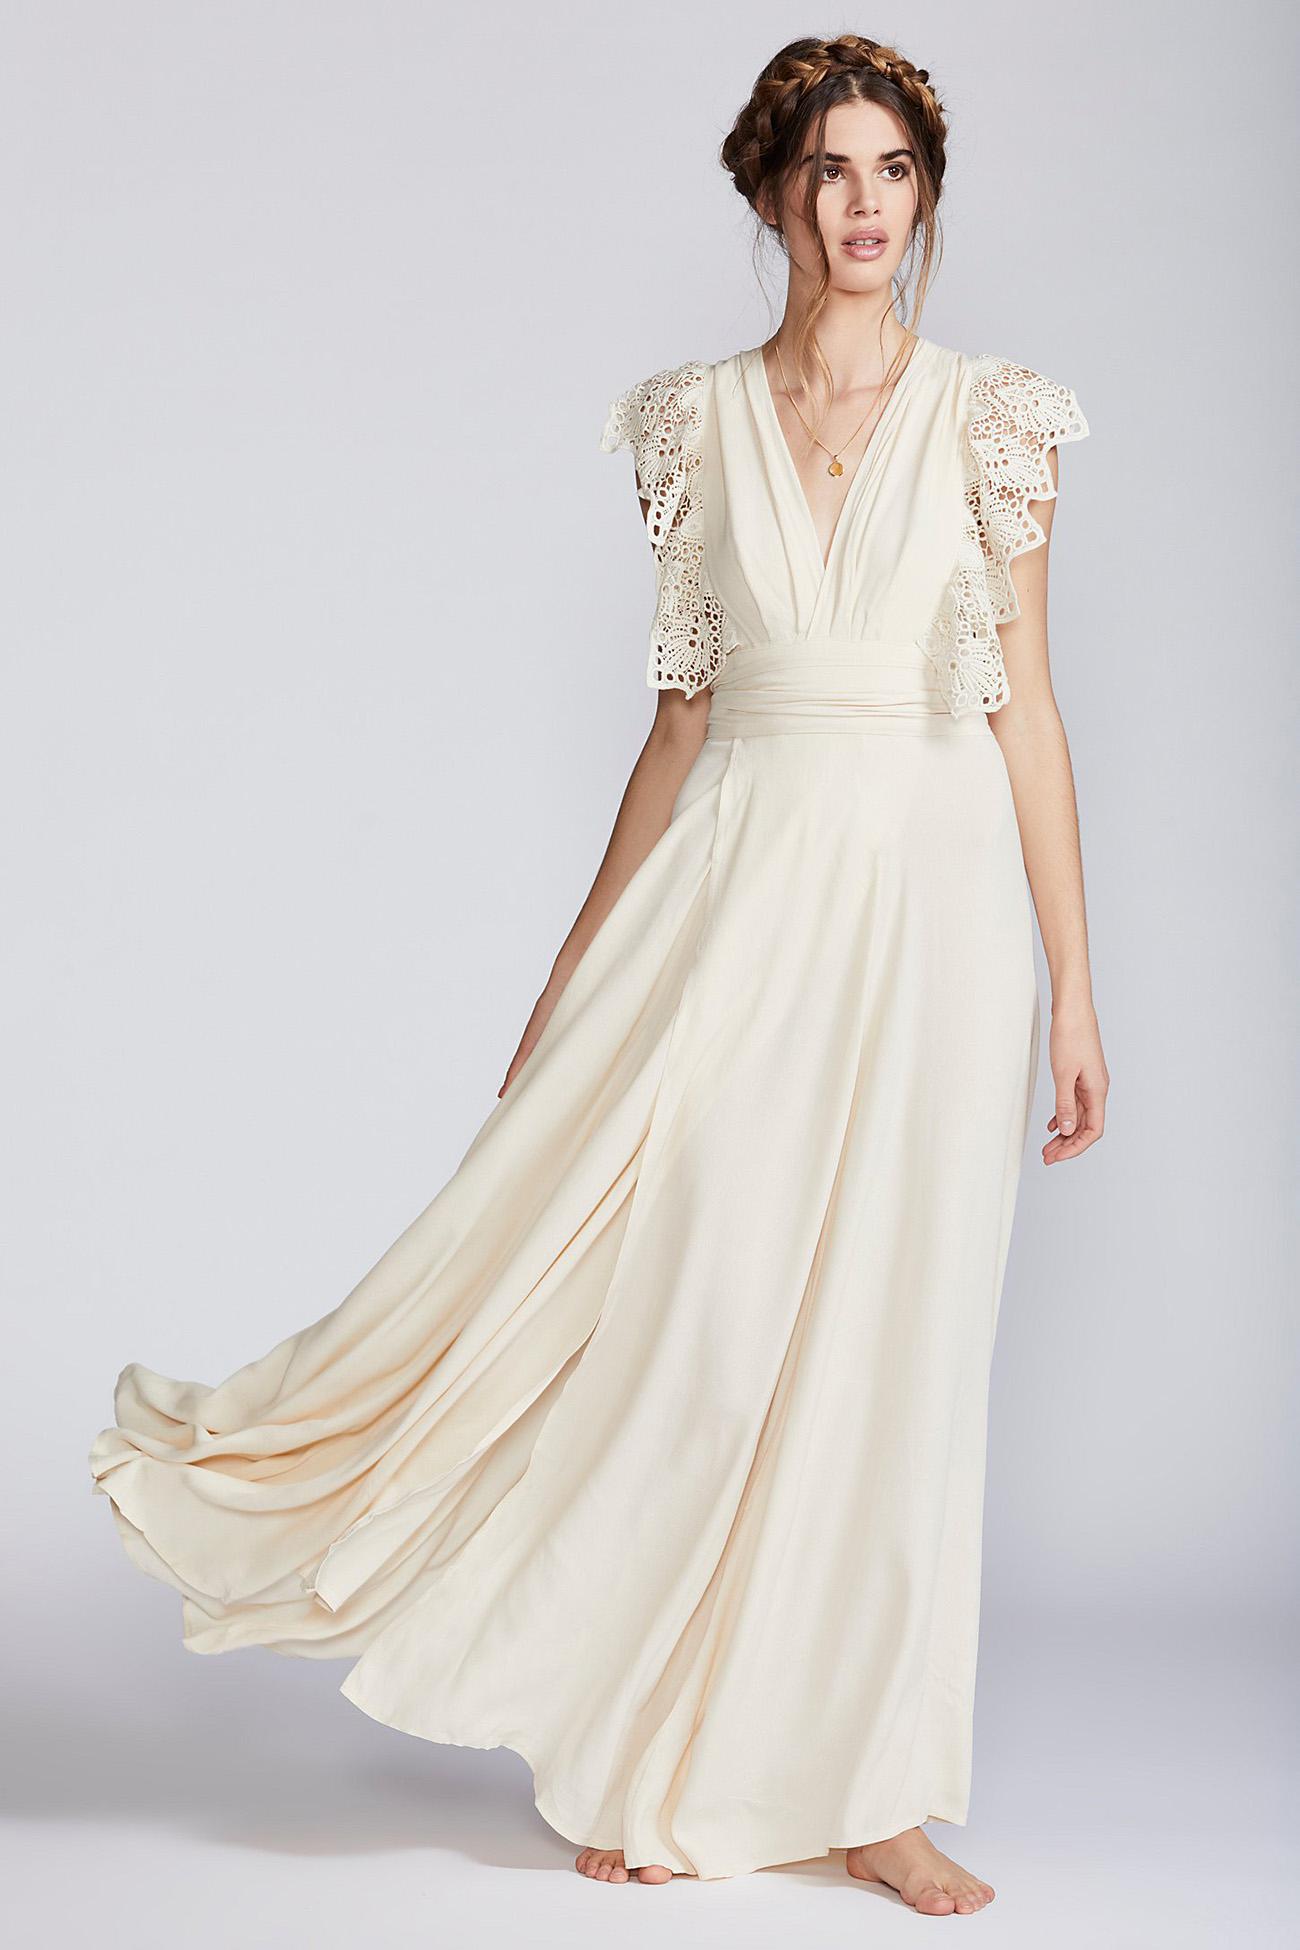 Our Favorite Wedding Dresses Under 500 Green Wedding Shoes